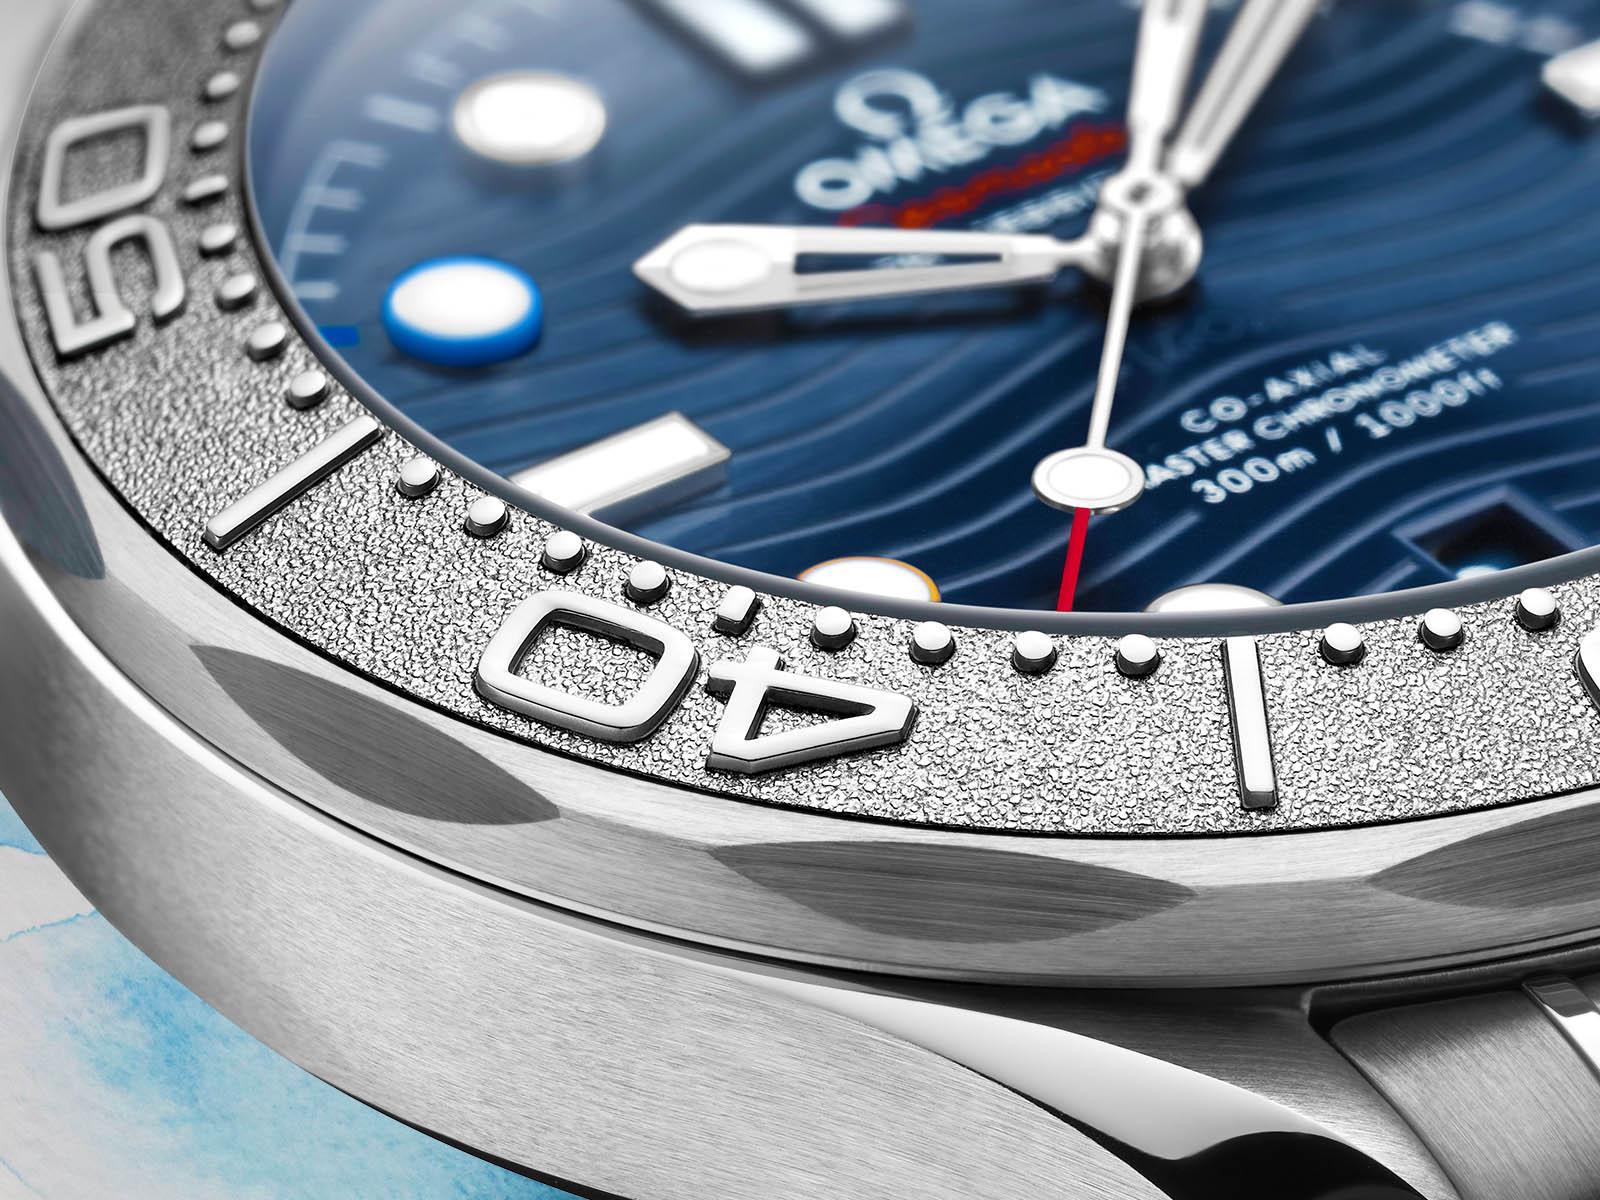 522-30-42-20-03-001-omega-seamaster-diver-300m-beijing-2022-special-edition-4.jpg